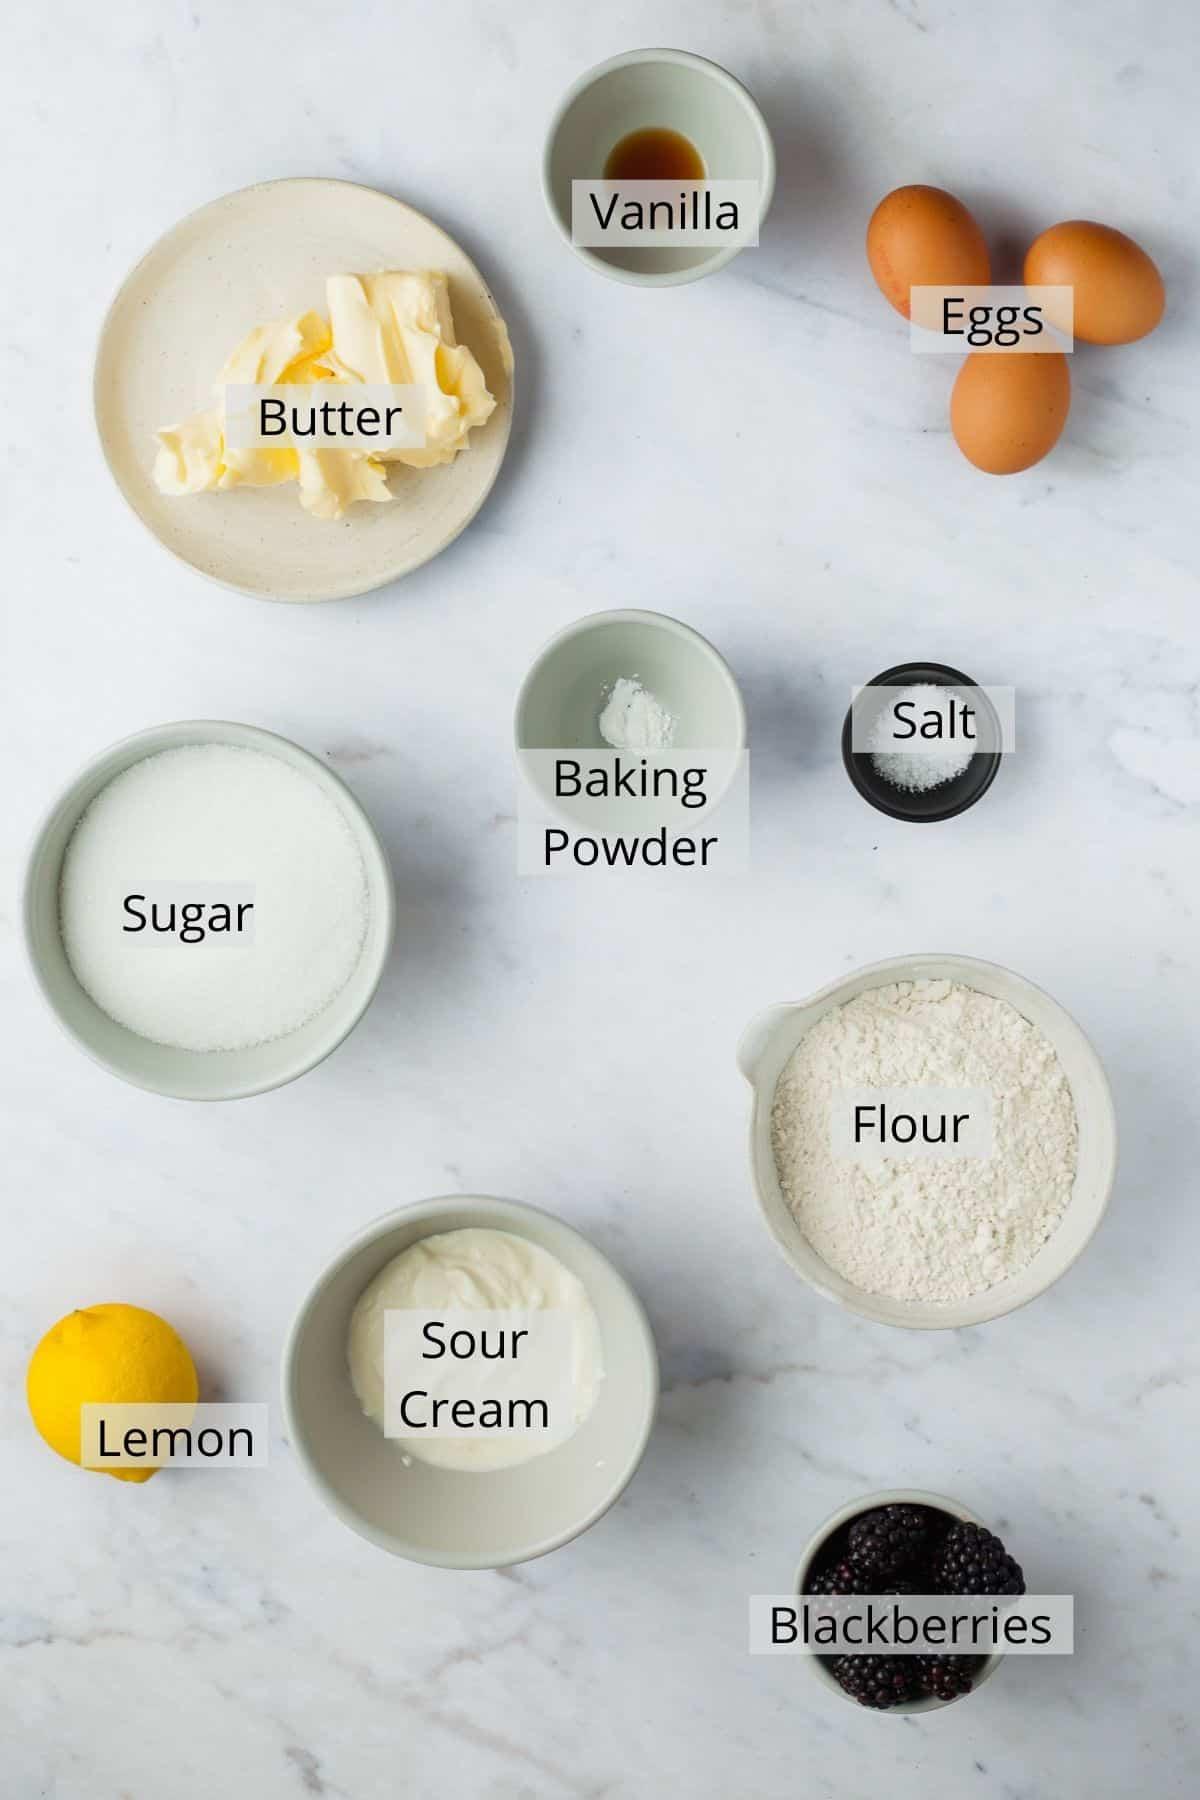 ingredients needed for blackberry lemon bread